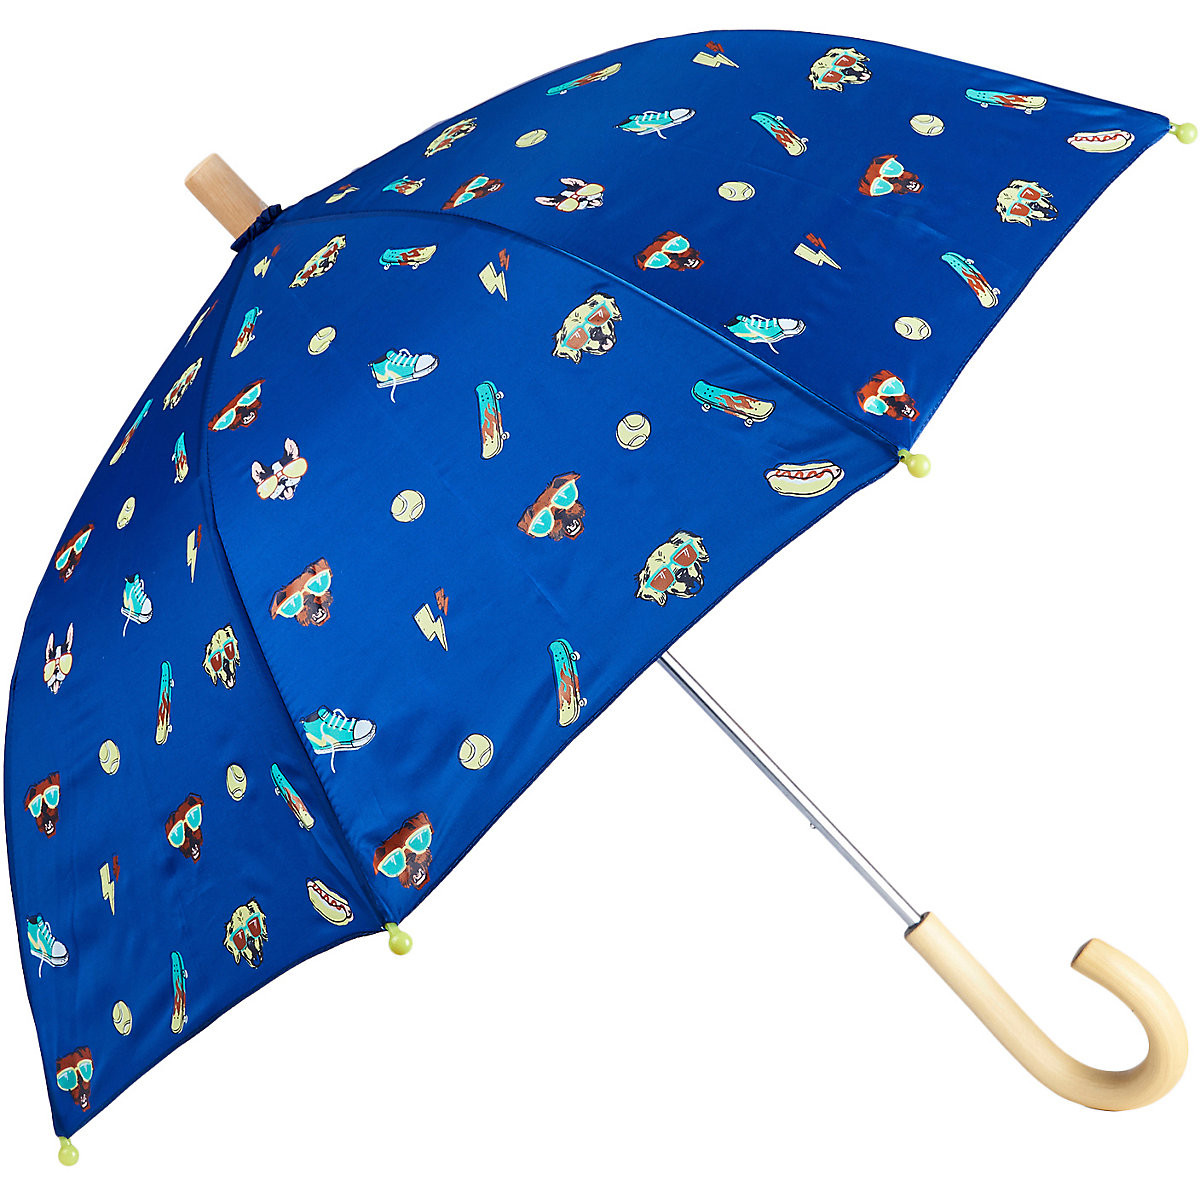 Hatley Umbrellas 10740750 umbrella rain protection for children of boys and girls